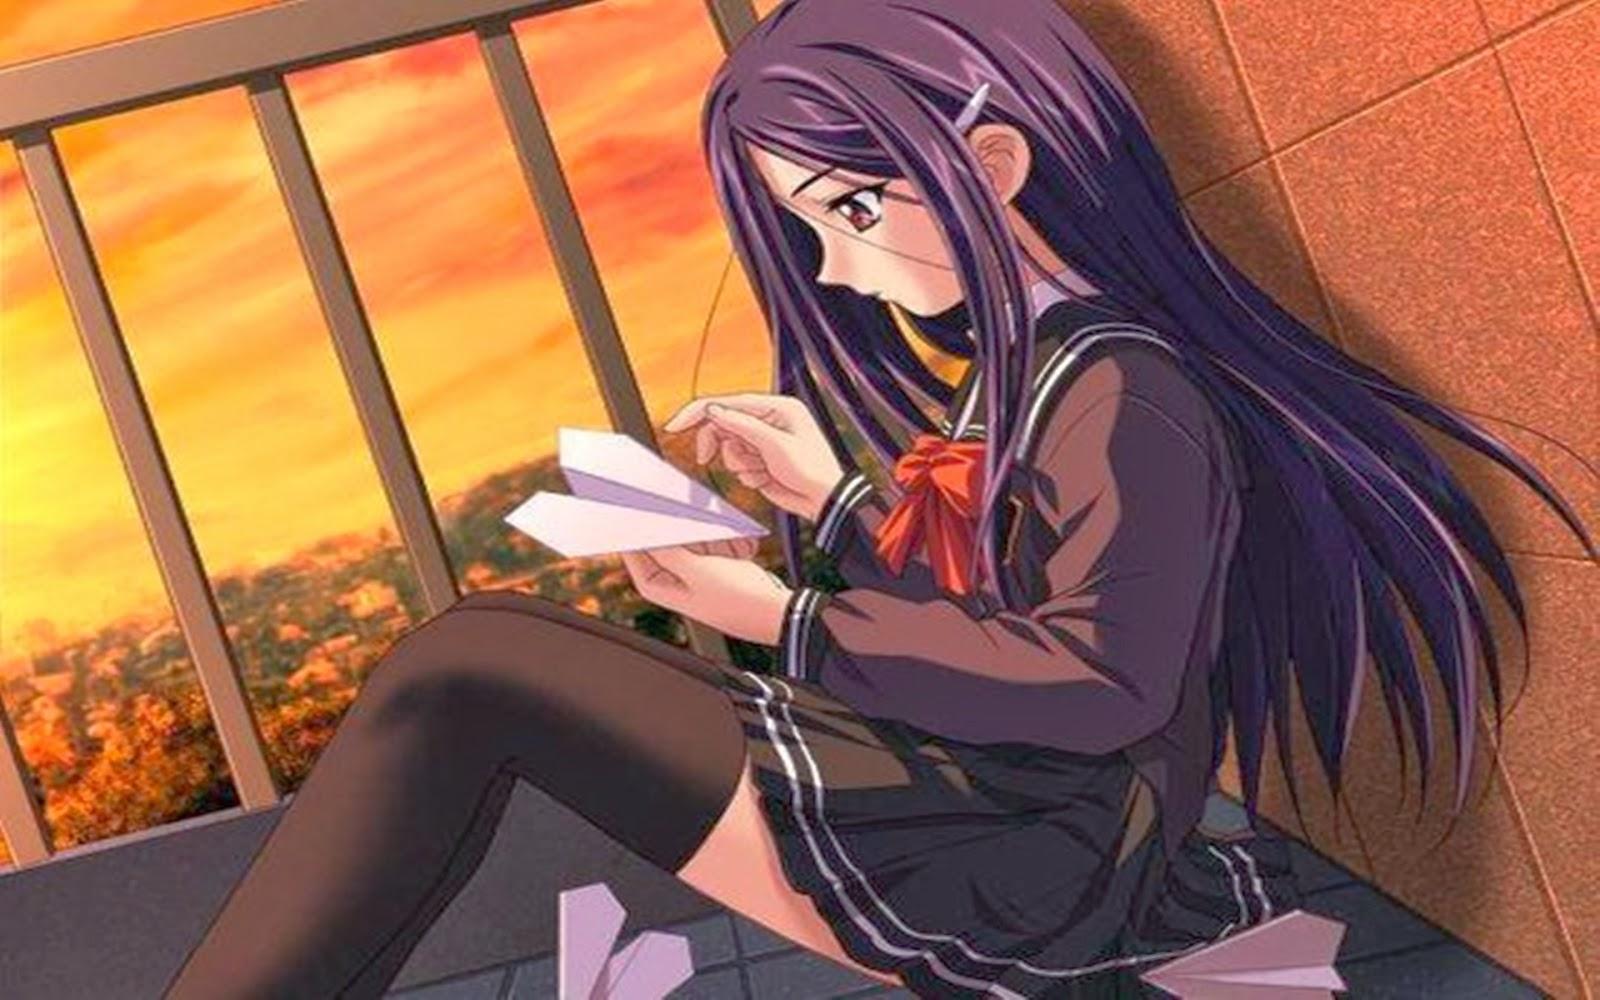 Sad girl anime wallpaper for Desktop Facebook Laptop Charming 1600x1000